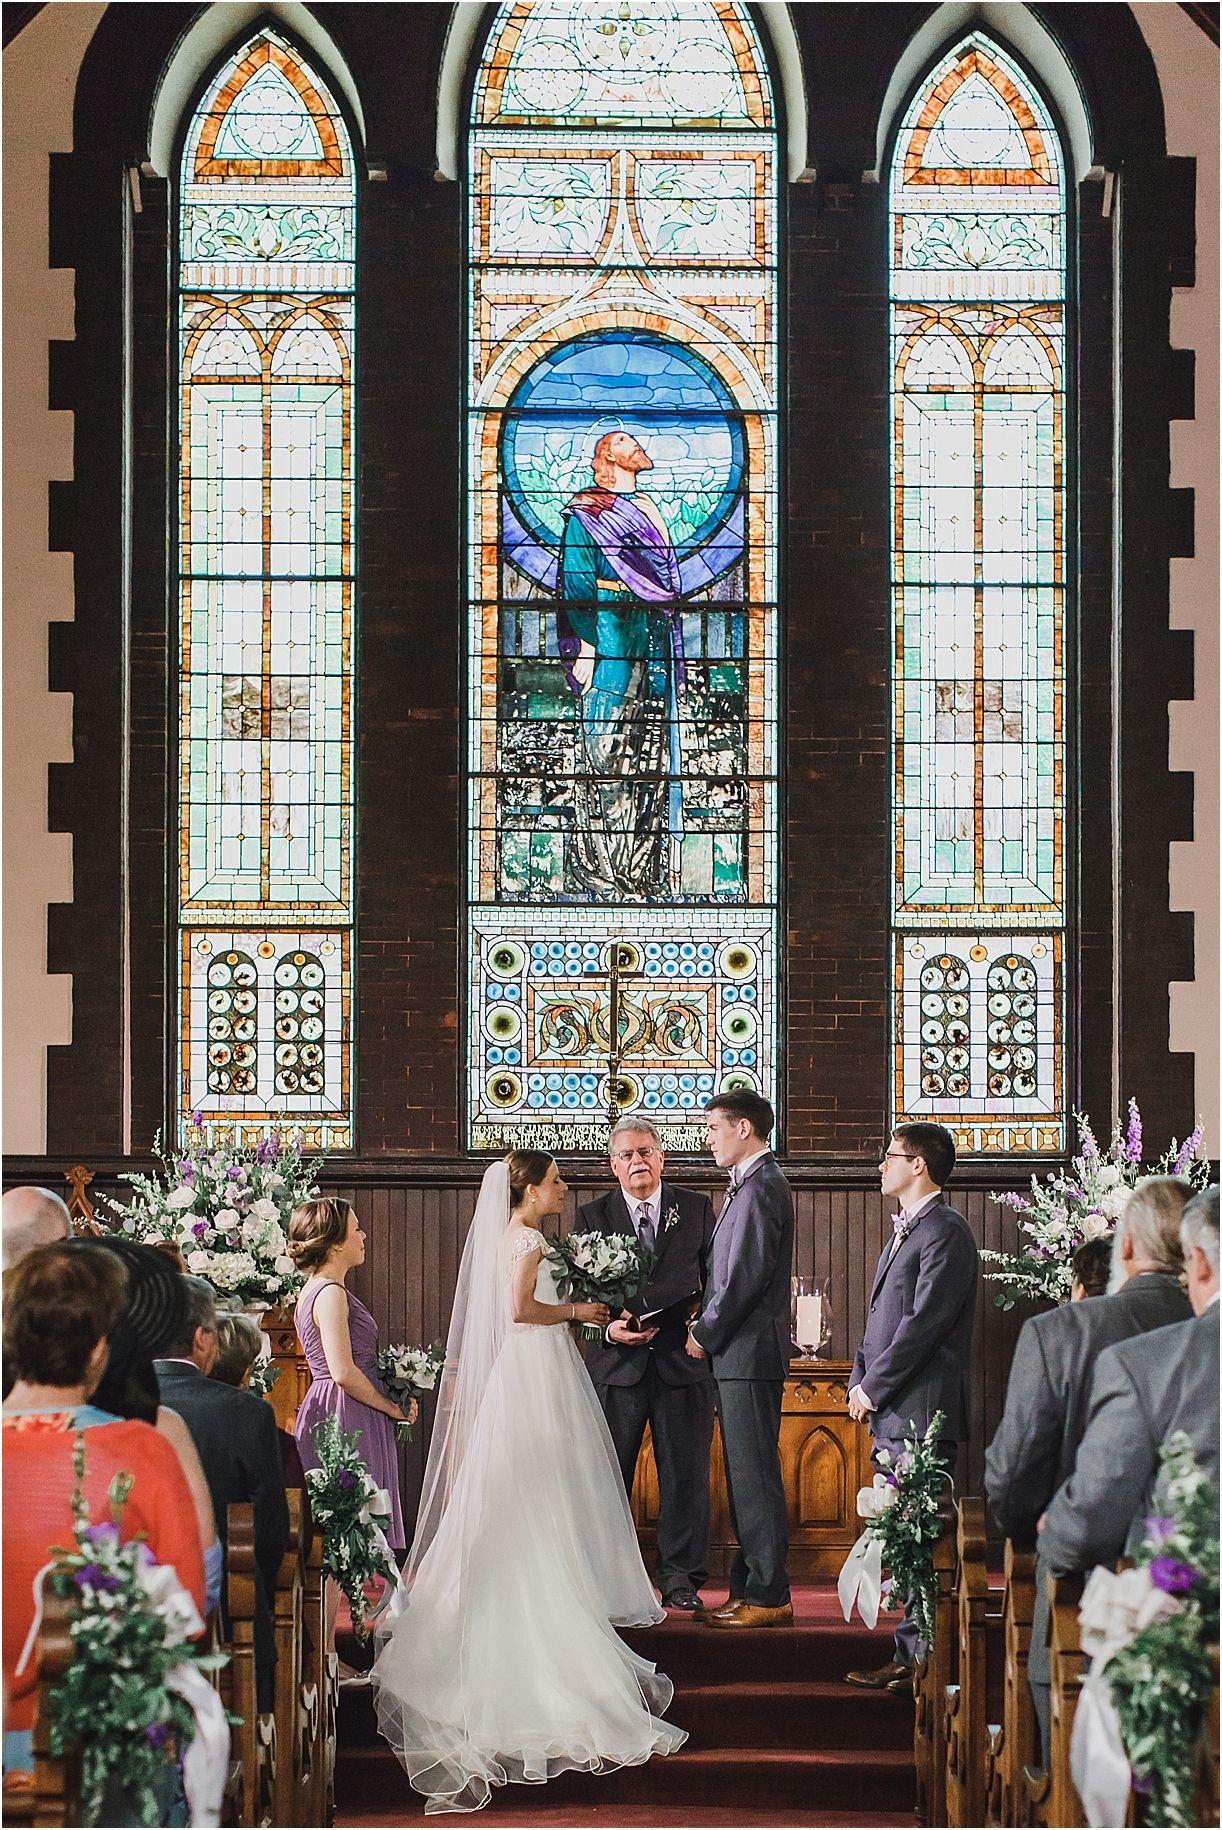 Stunning Uva Chapel Wedding In Purple Hues Best Of Bridal